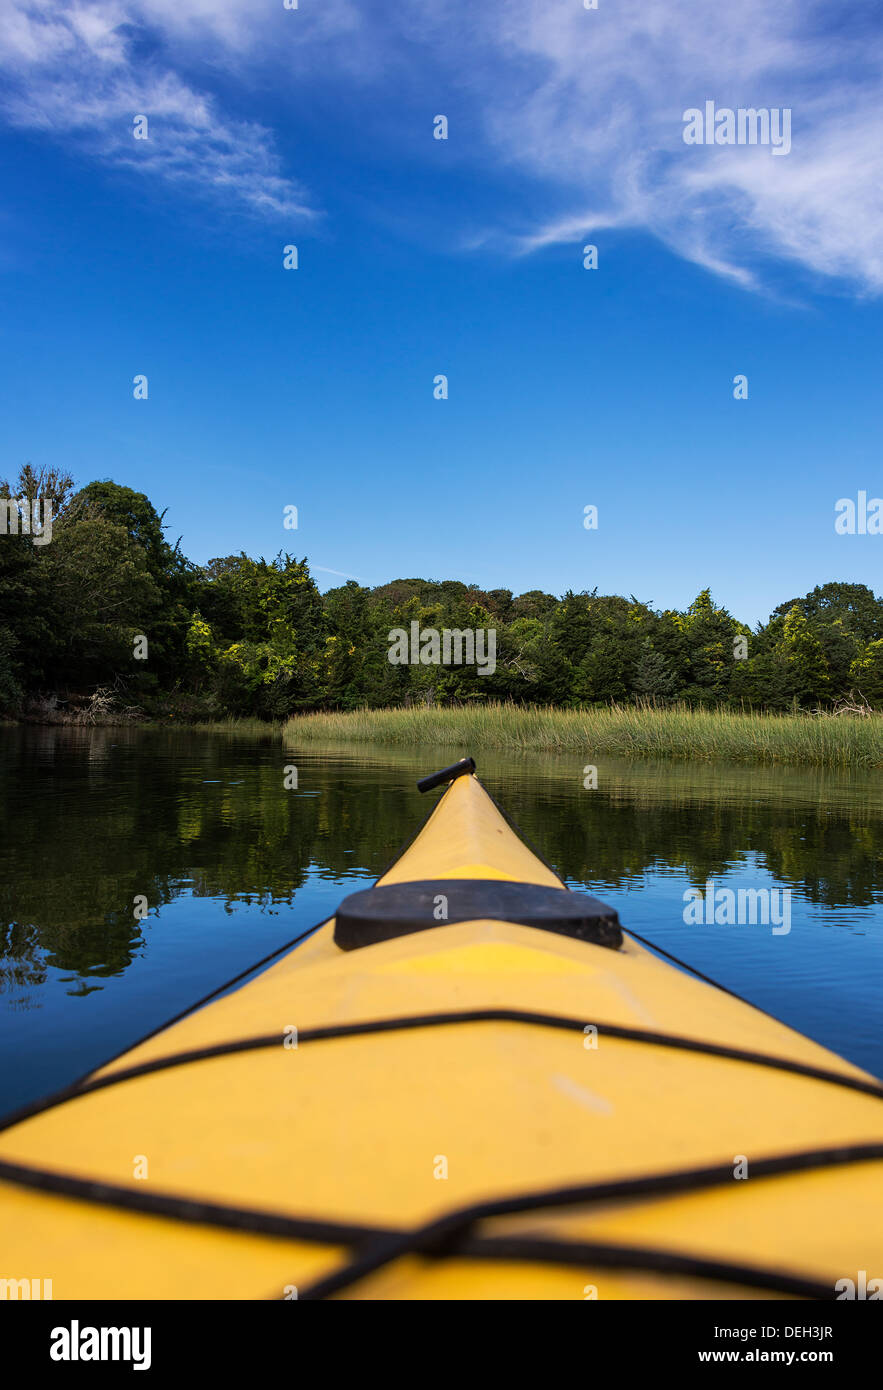 Kayak point of view of coastal waterway, Cape Cod, Massachusetts, USA - Stock Image